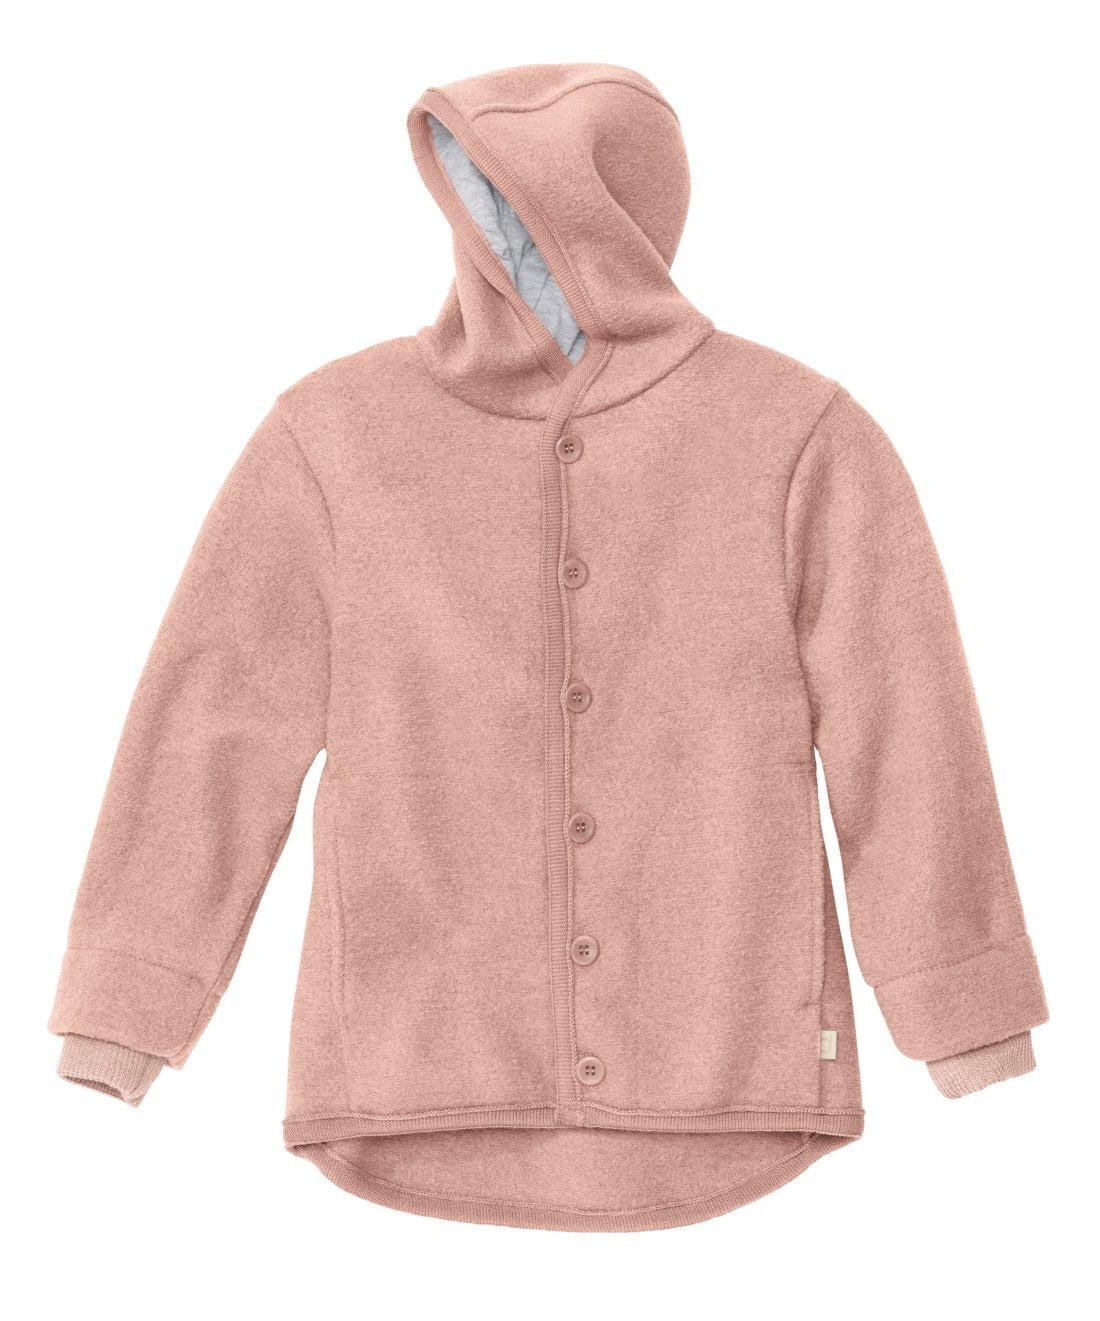 Jachetă Disana din lână merinos boiled wool Rose